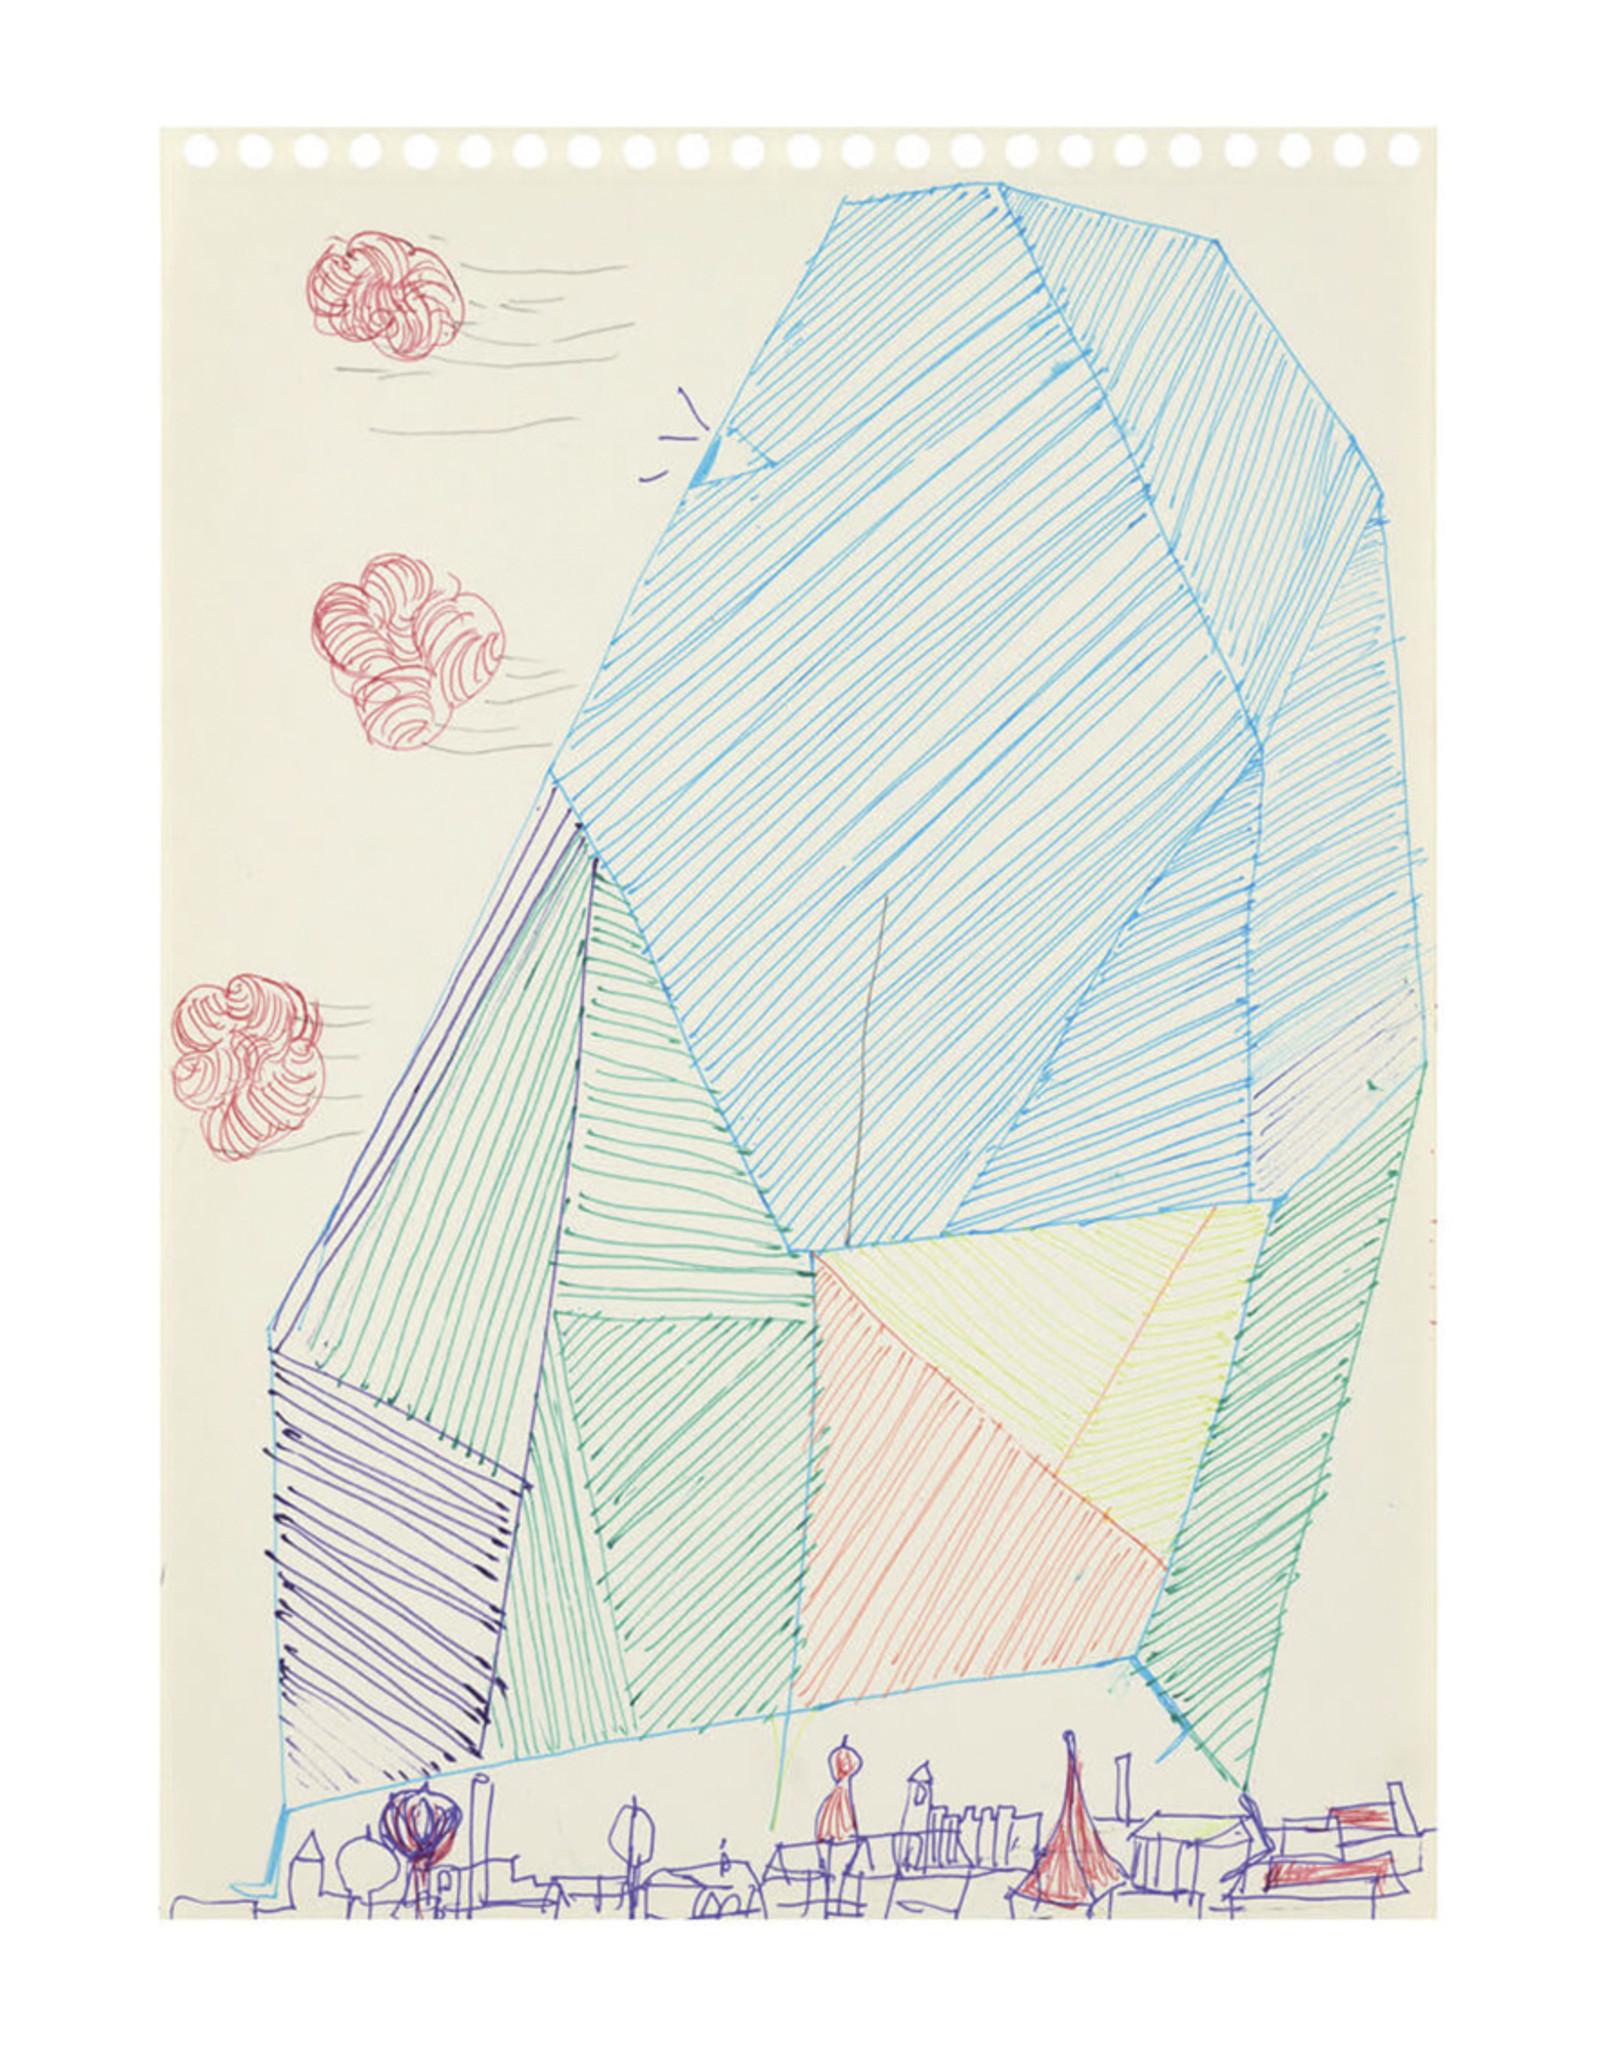 Philippe Vandenberg - 4 x Molenbeek - Poster Pakket